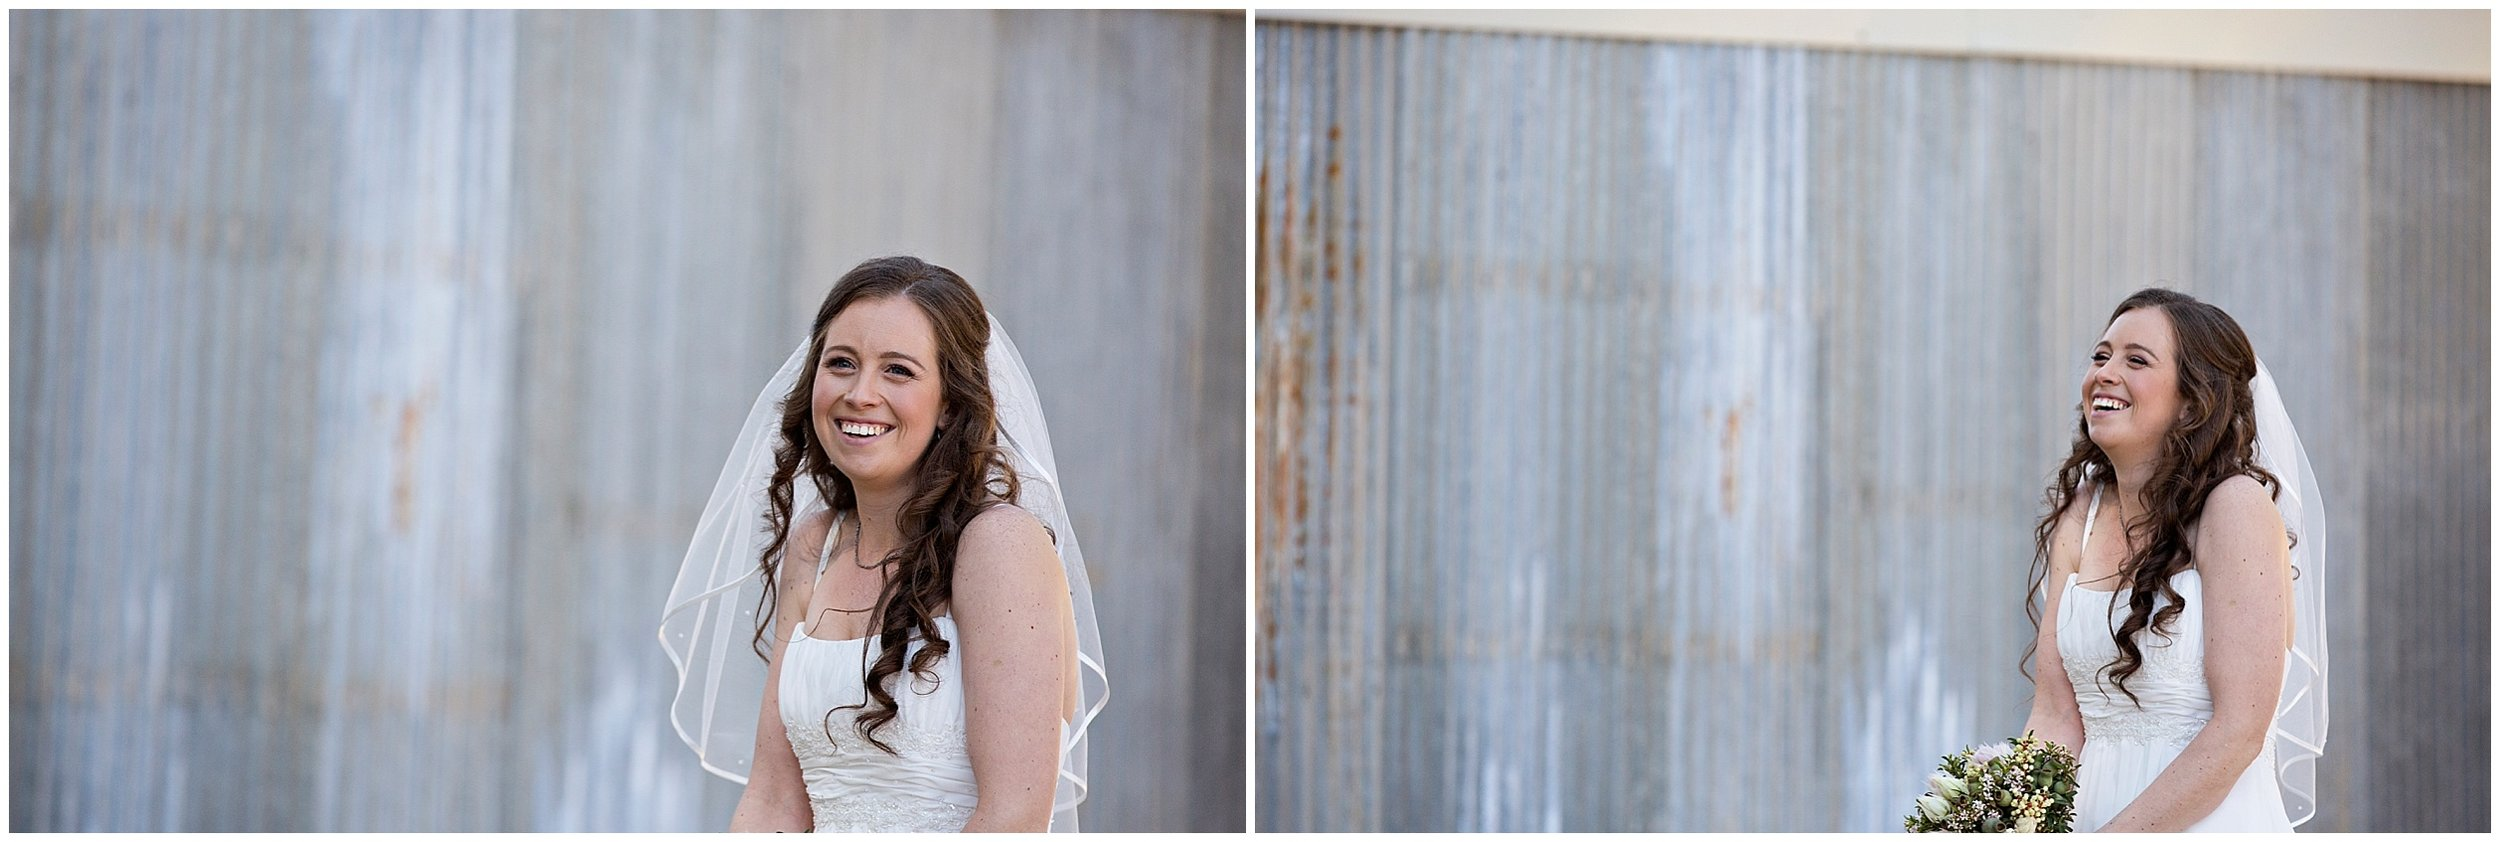 shepparton-wedding-photographer_0062.jpg